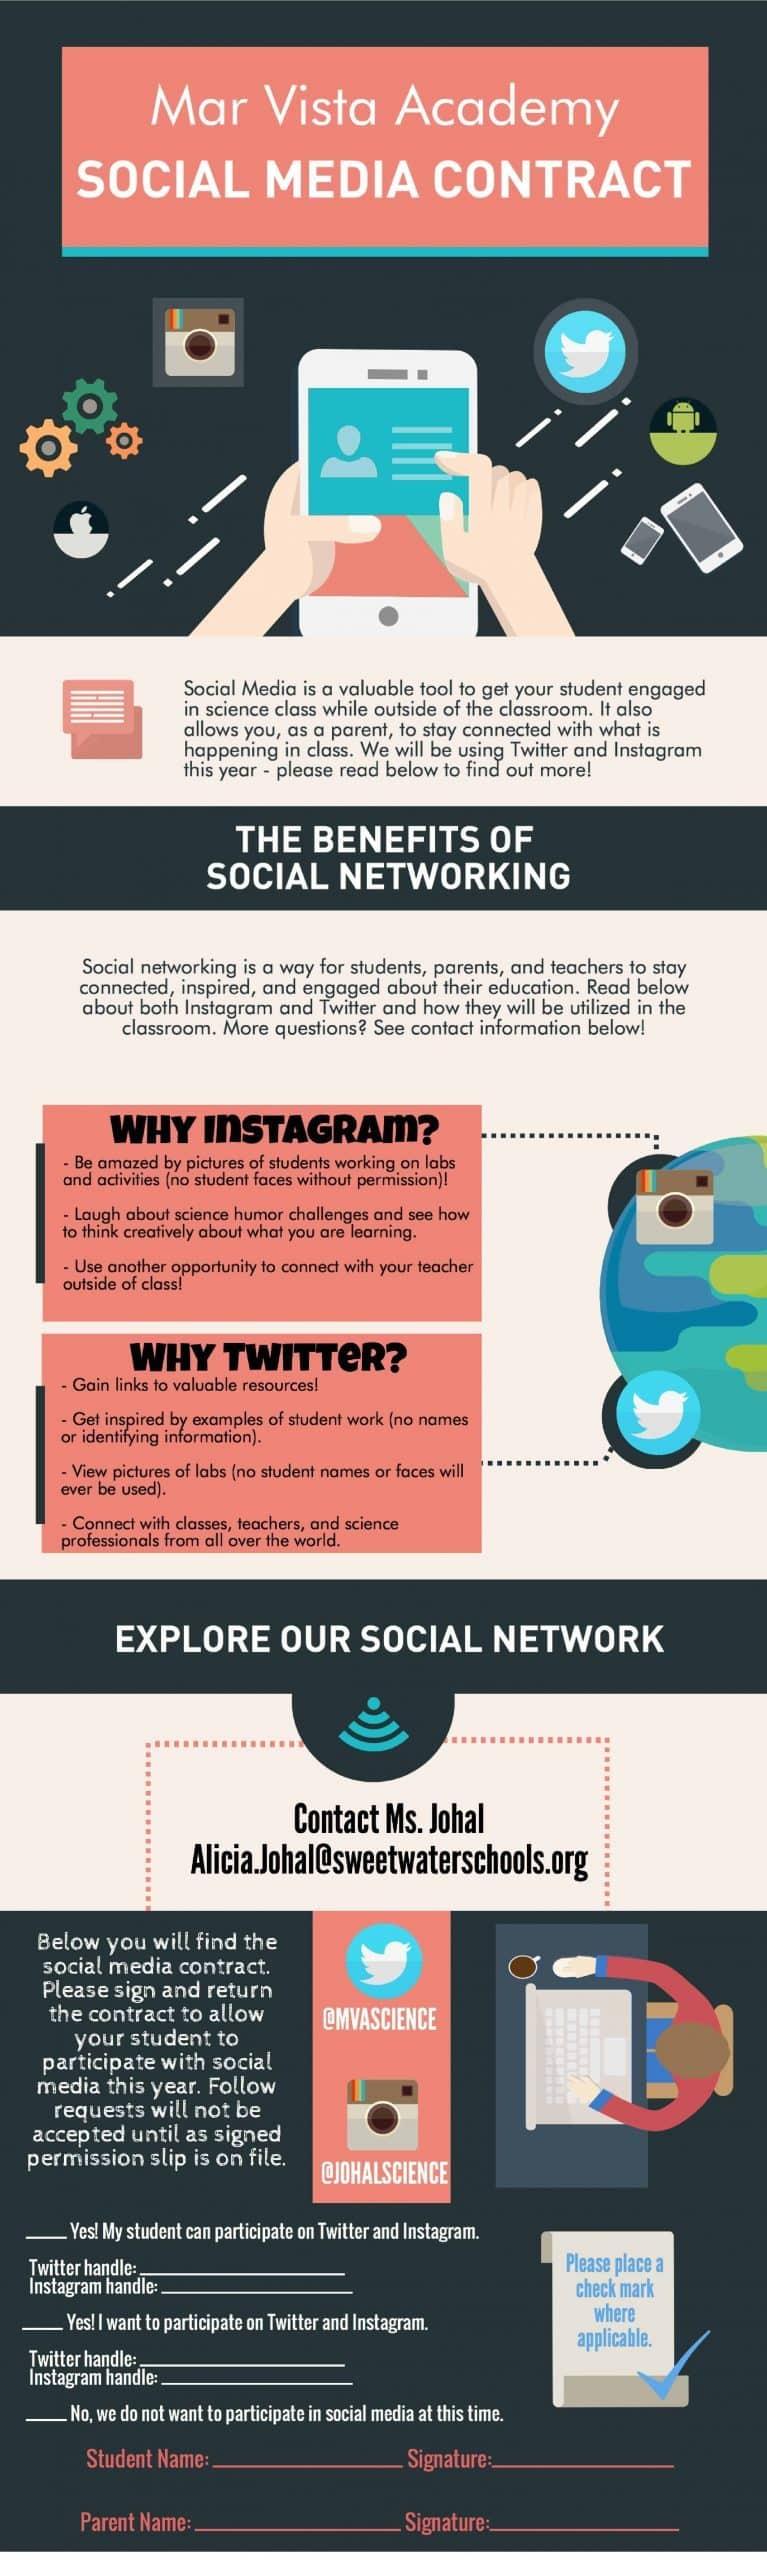 mva-social-media-contract-page-001-5202262